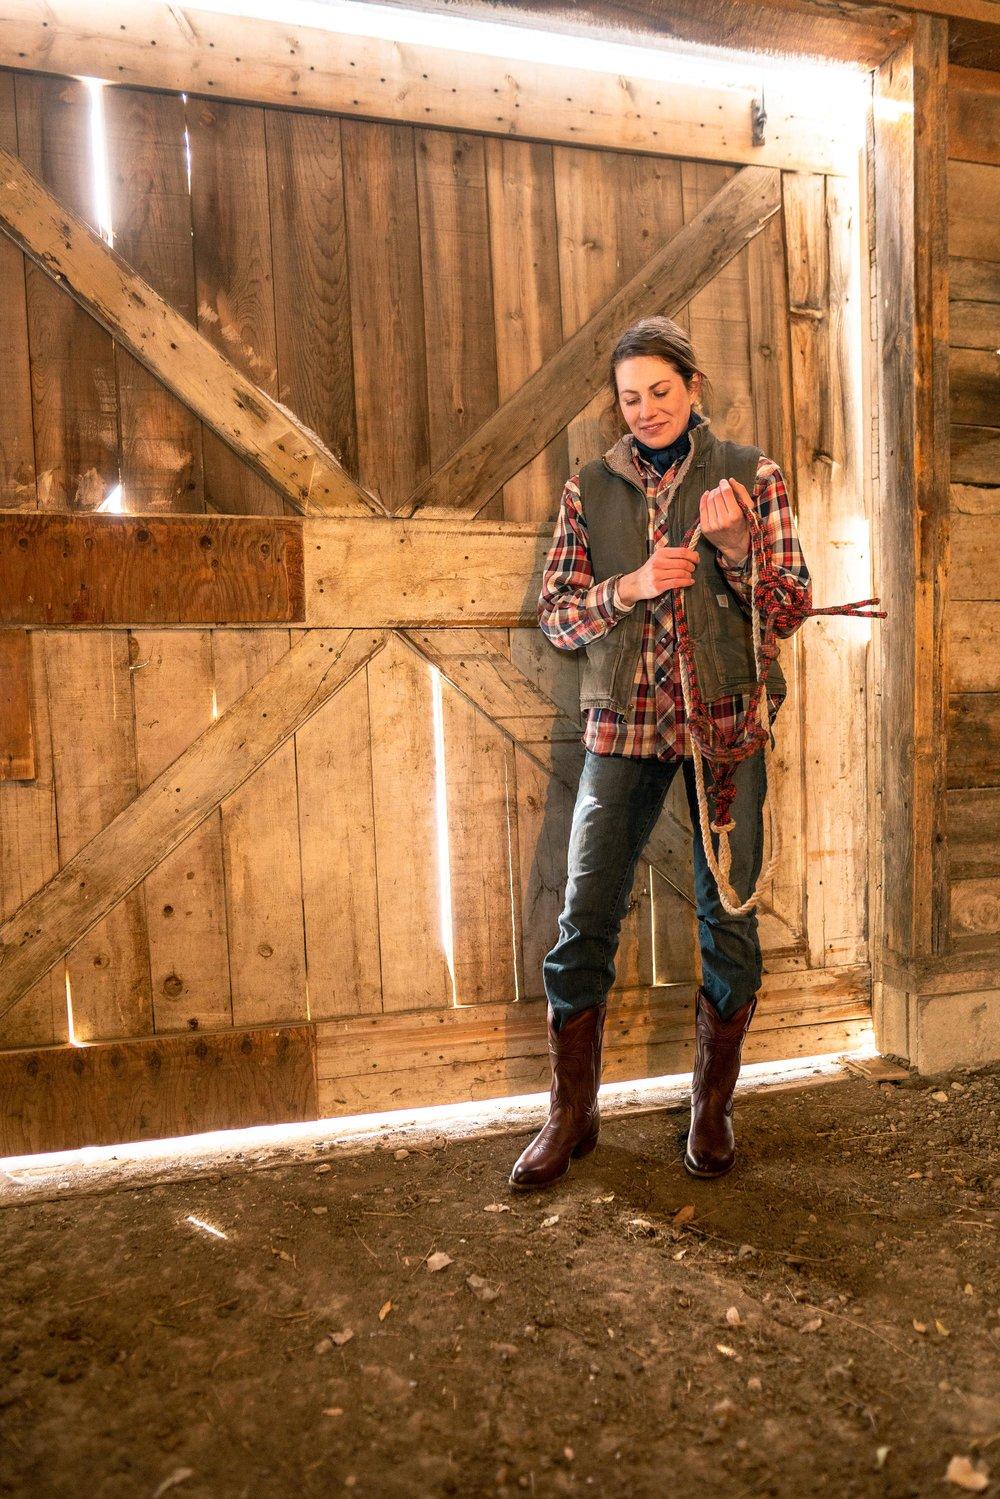 Jenna Flatgard preparing to get her horse in her barn in eastern Montana.